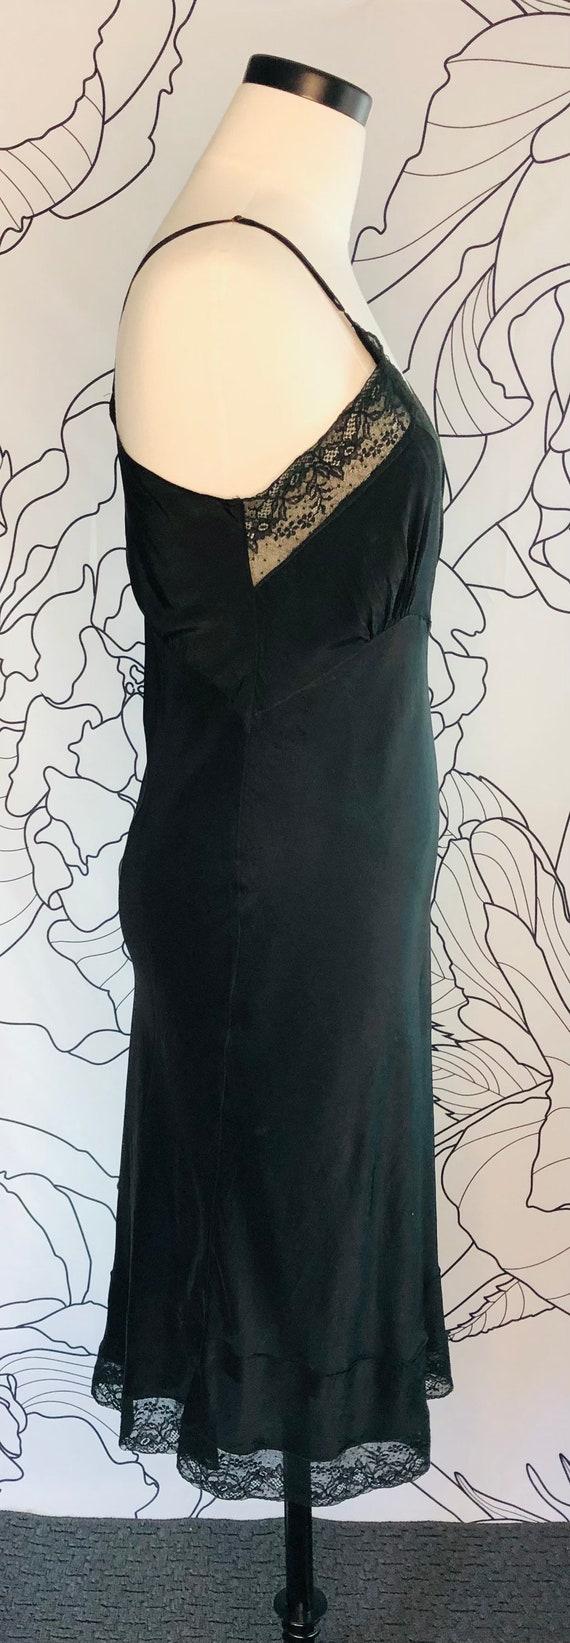 Circa 1940-50s Vintage Black Full Slip, Vintage T… - image 2